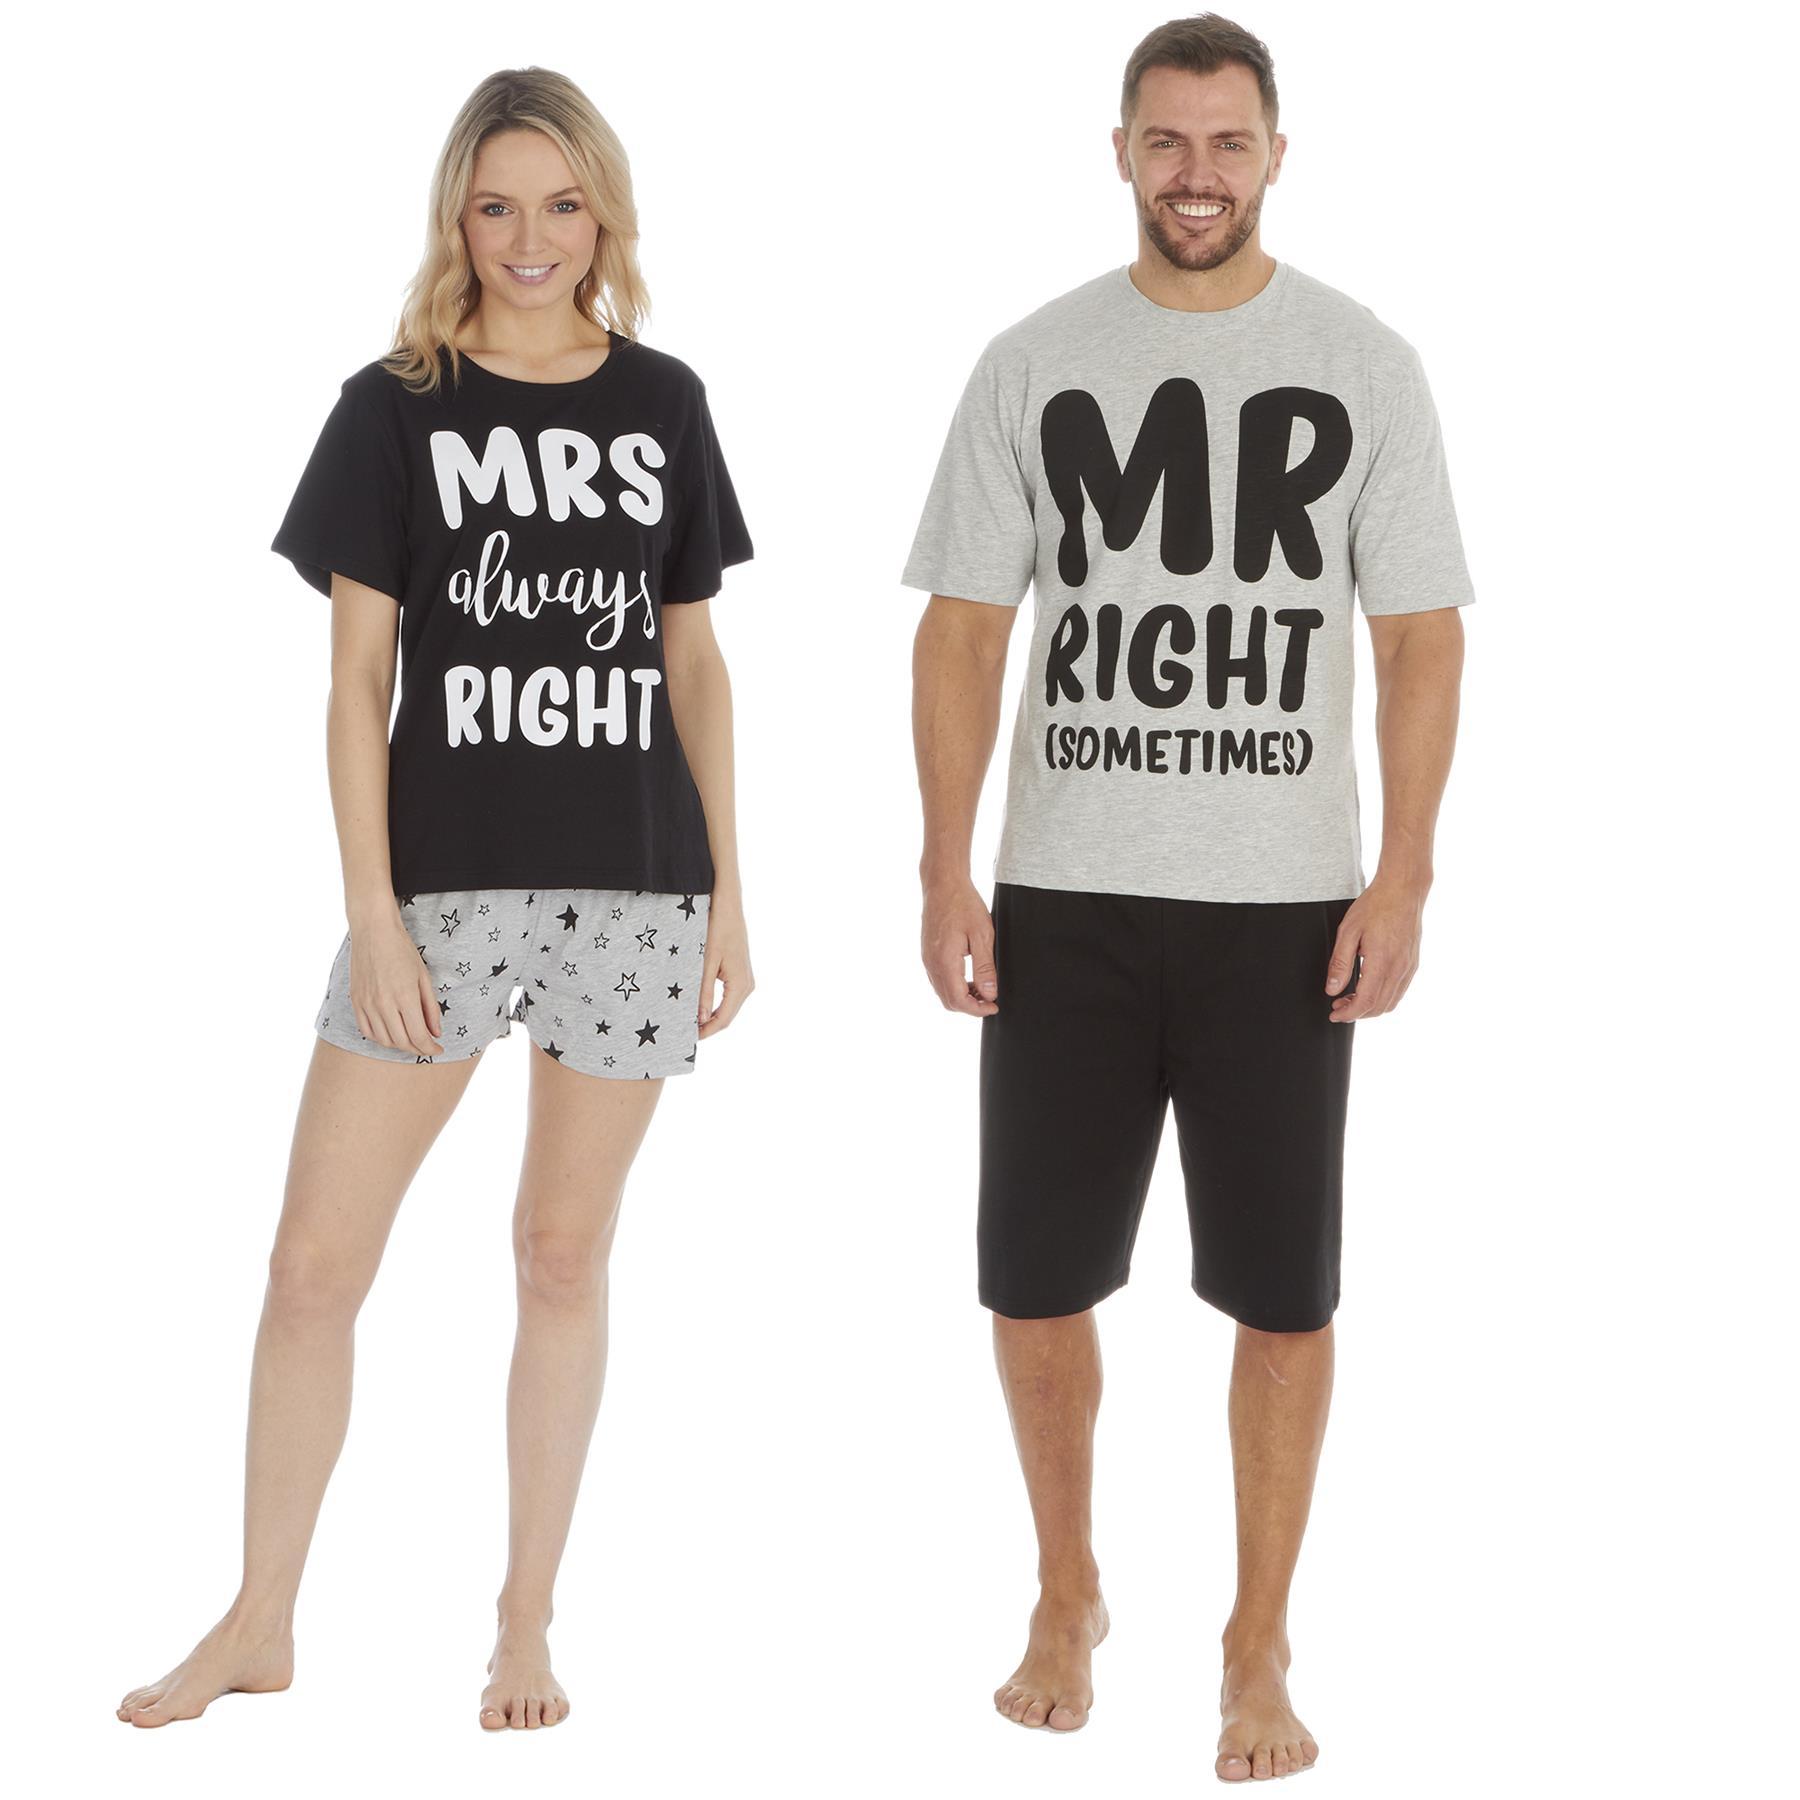 Hommes Femmes Mesdames correspondant Mr /& Mrs Right Fun Slogan Pyjamas Pjs Nightwear